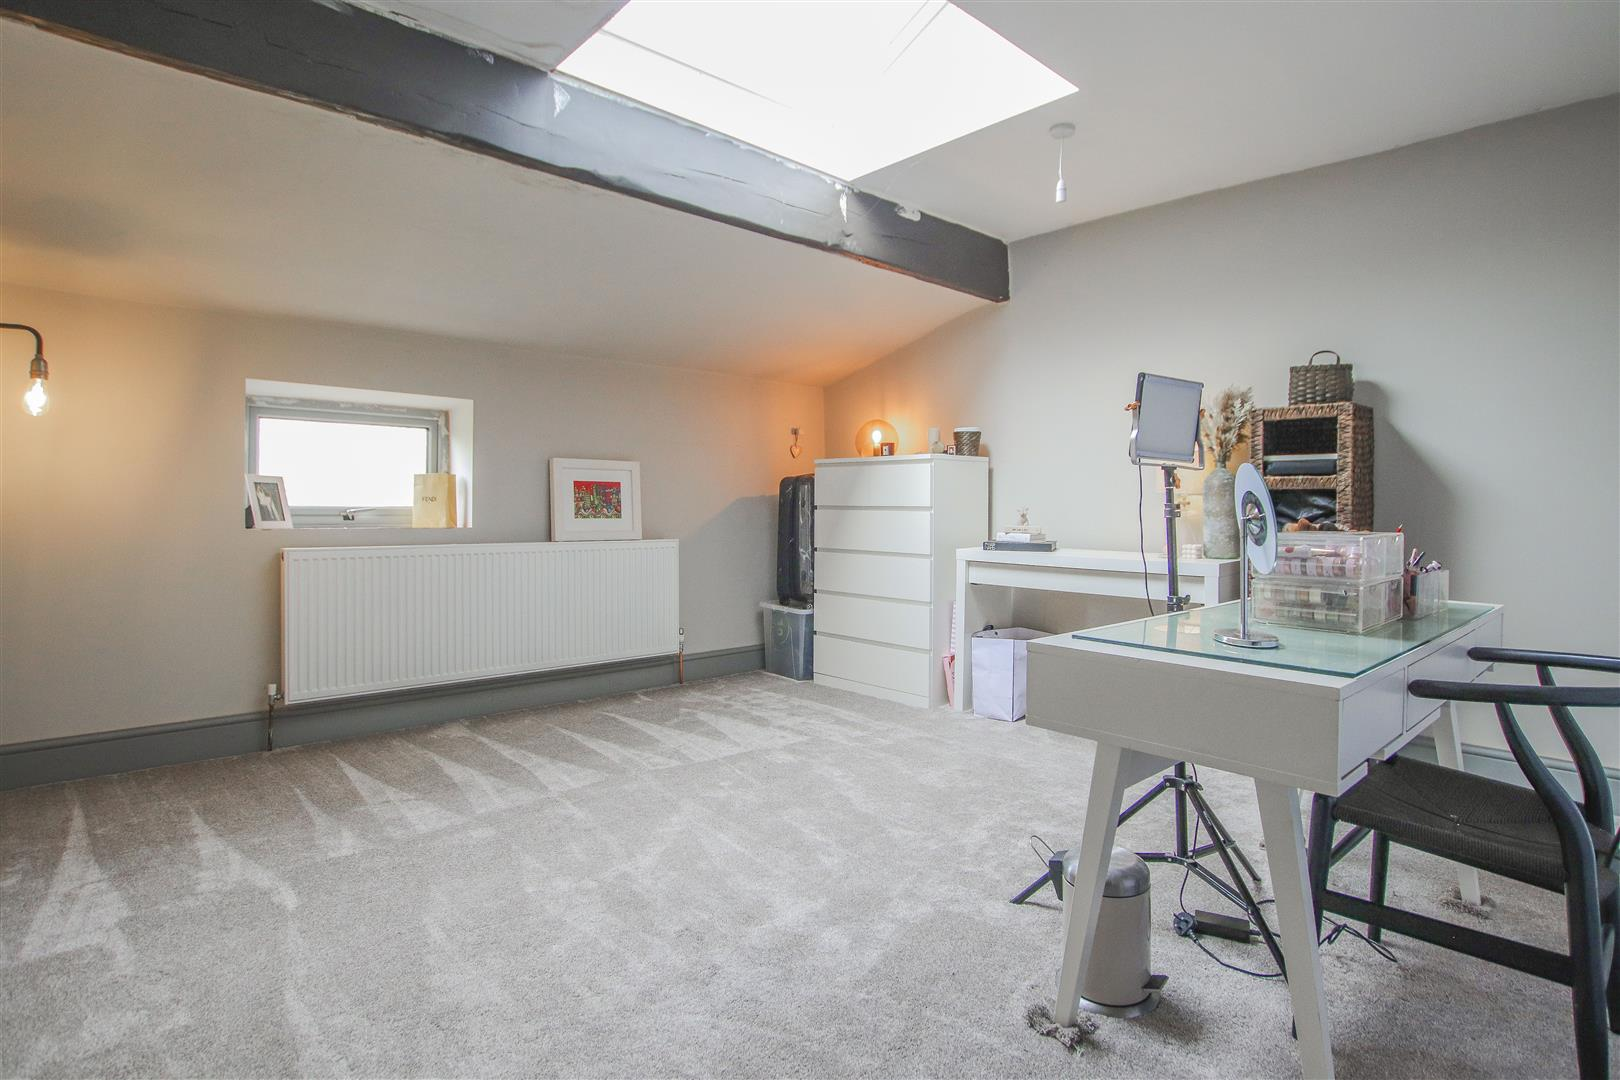 6 Bedroom Barn Conversion For Sale - 35.JPG